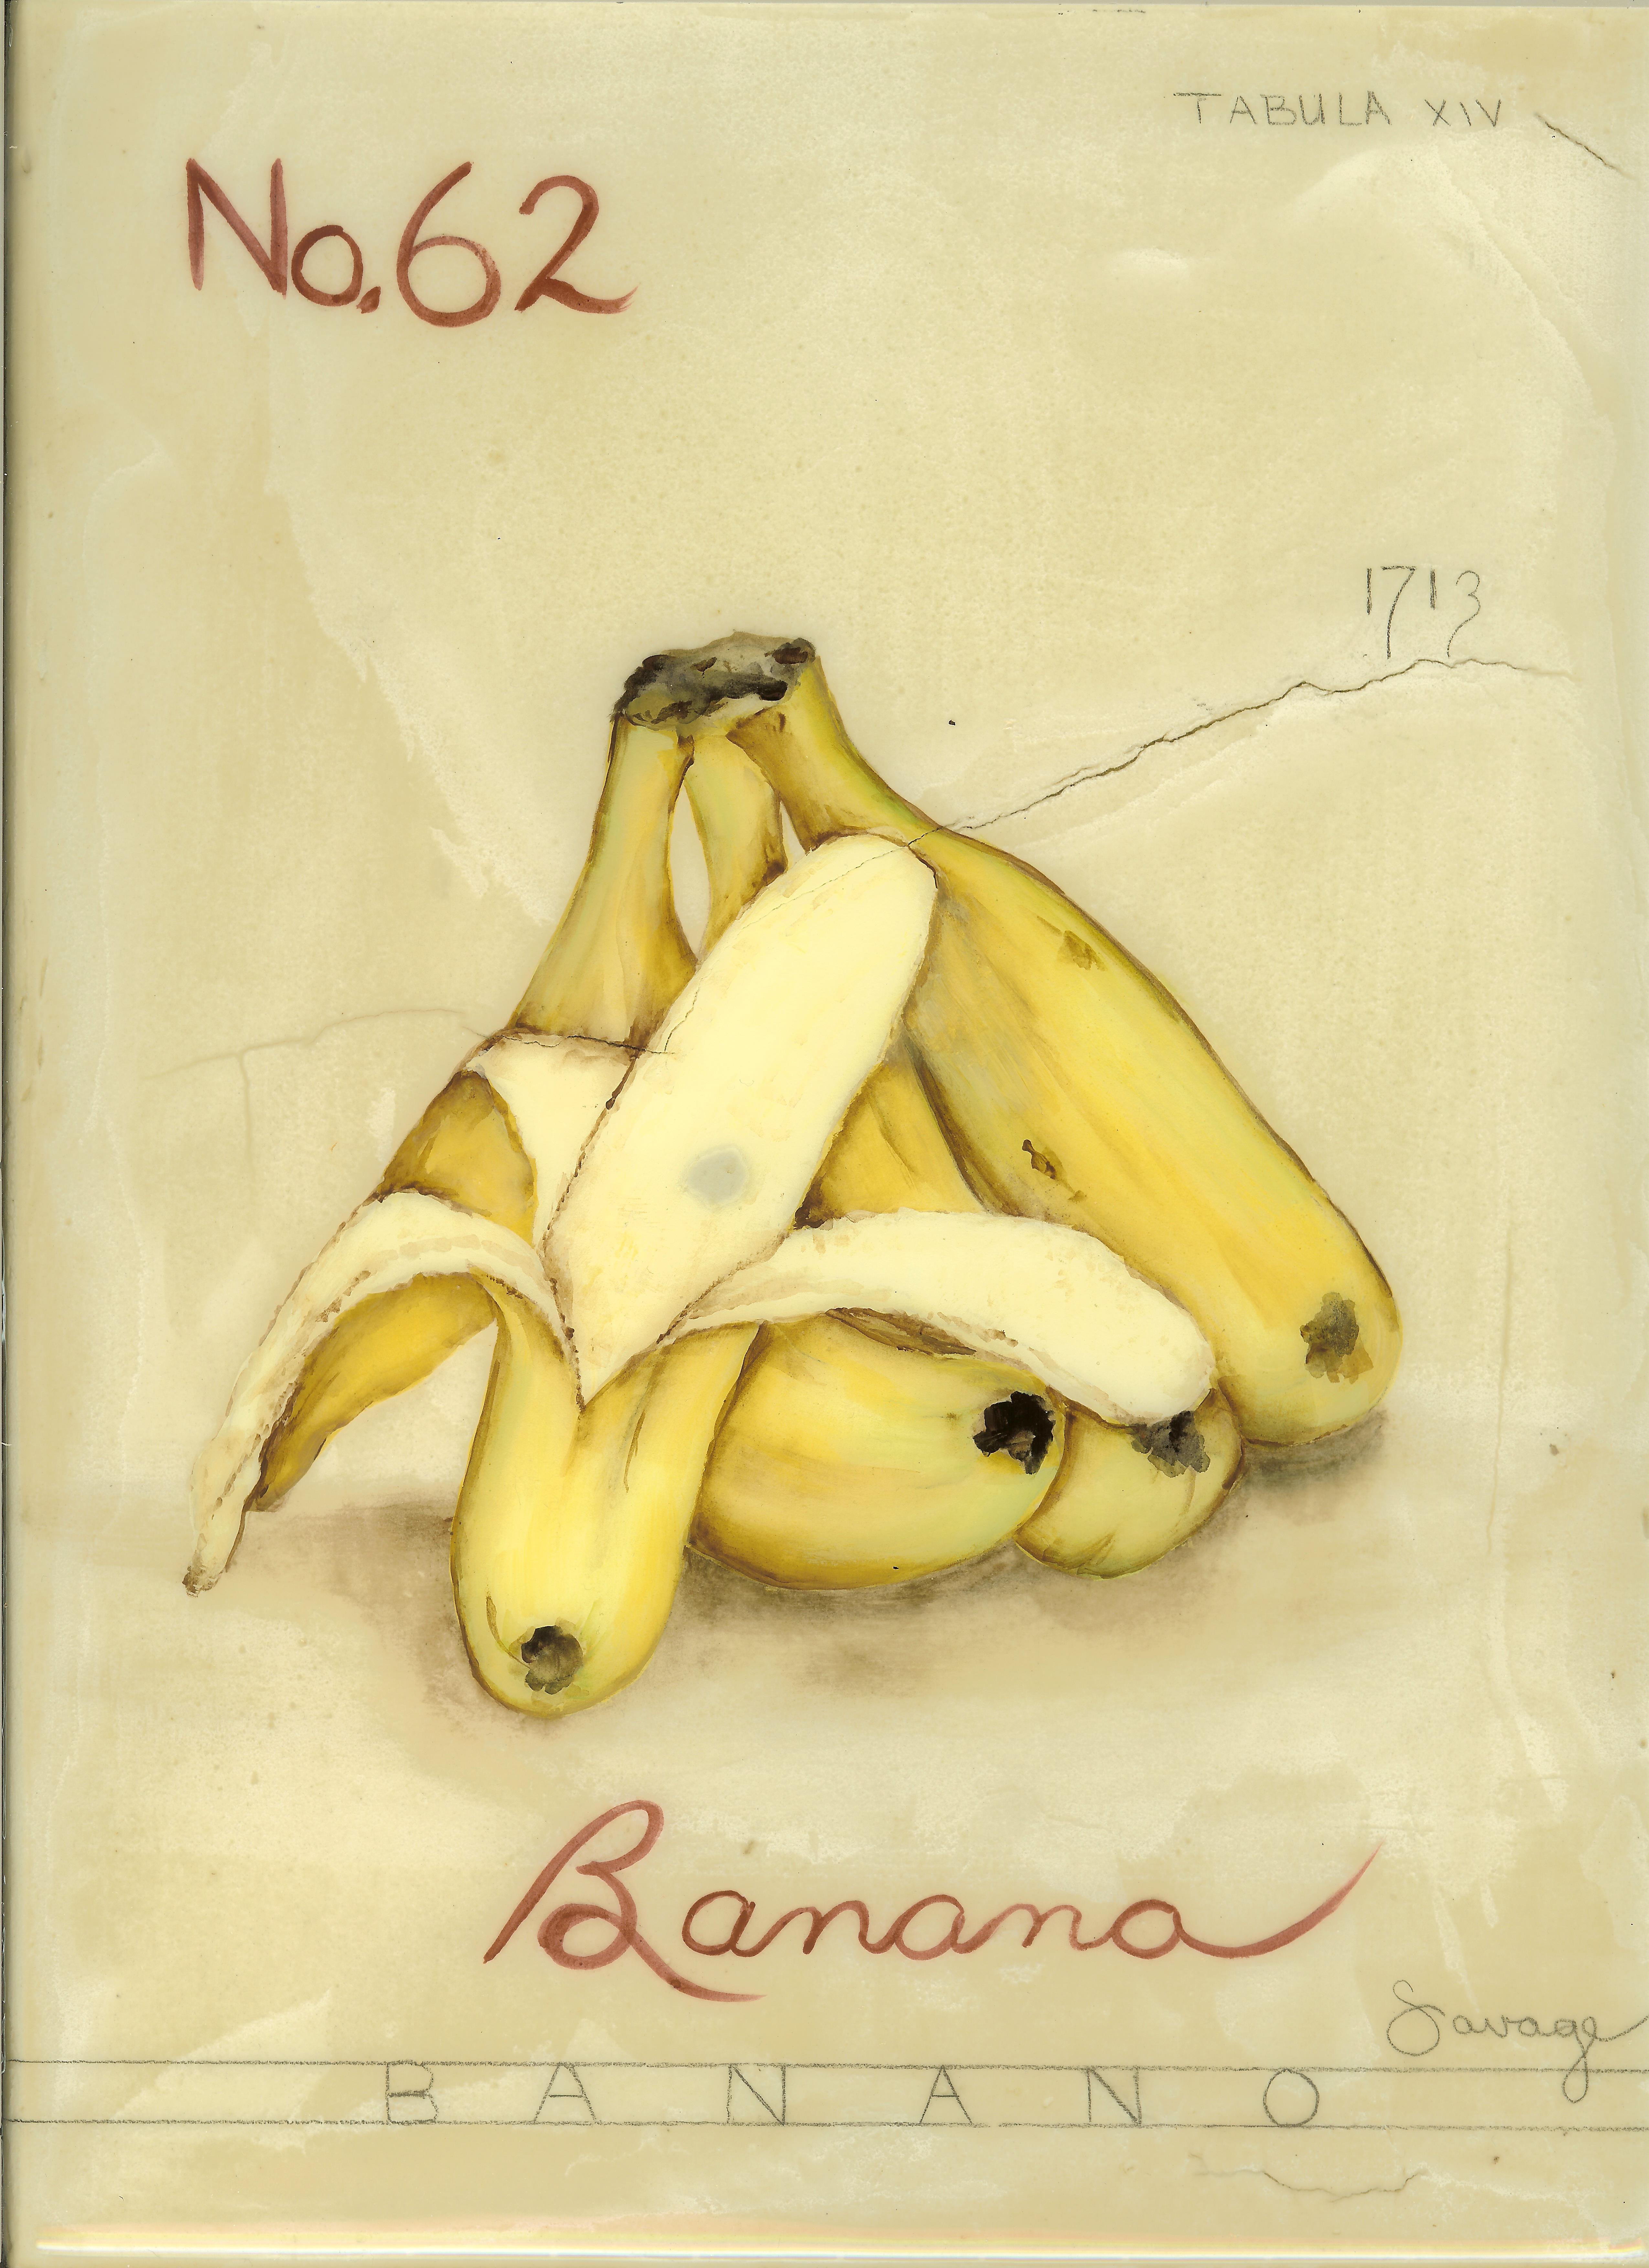 No. 62 Banana